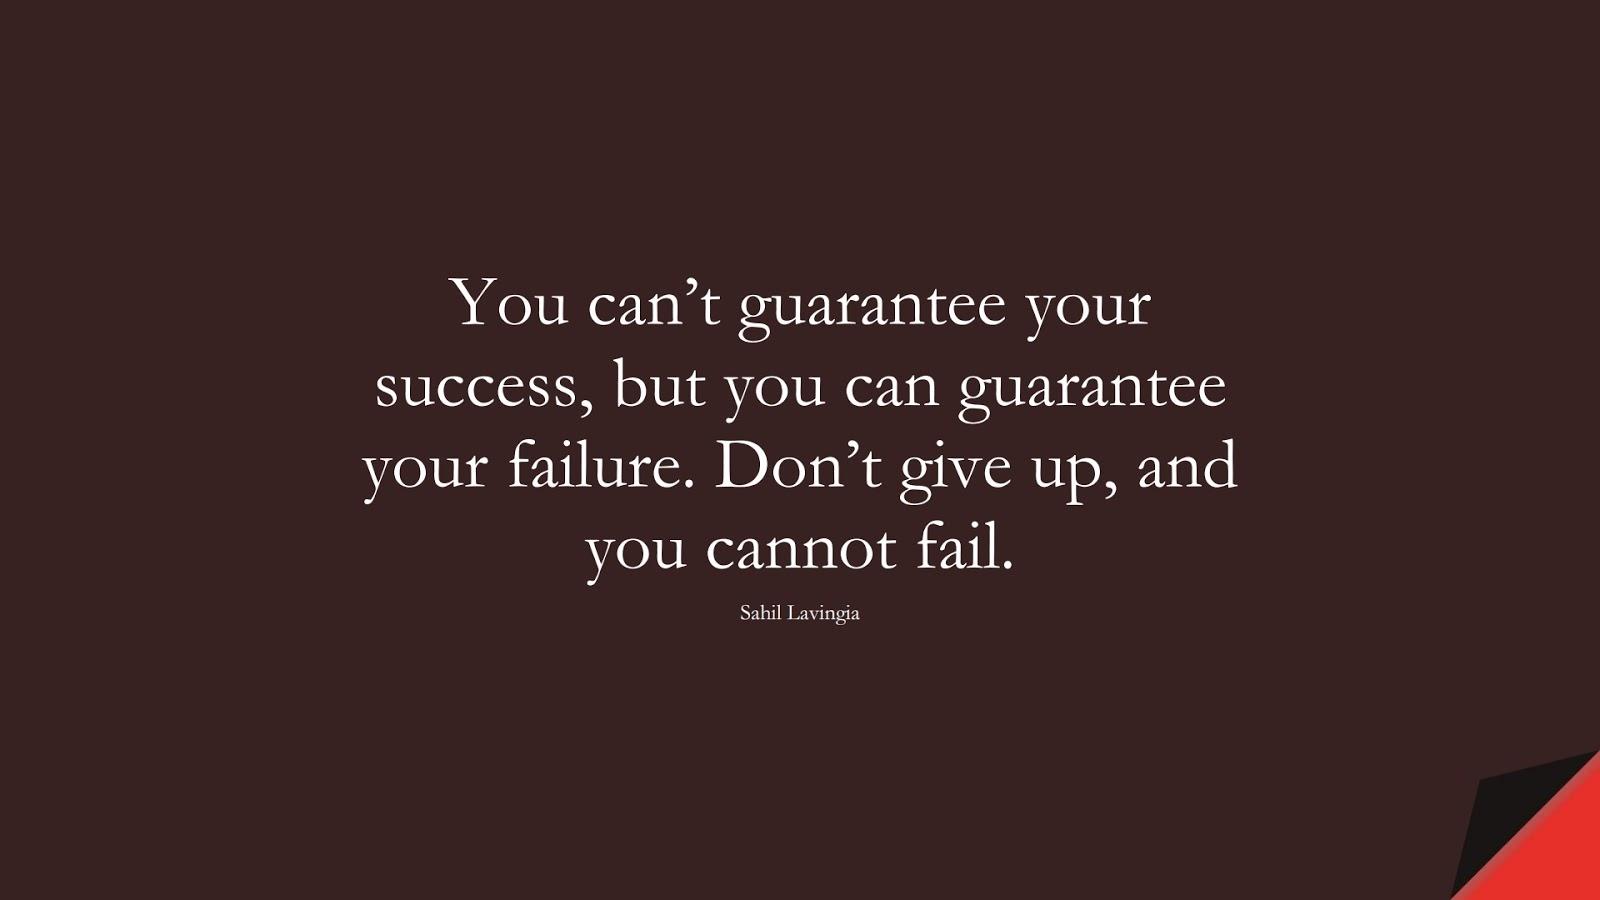 You can't guarantee your success, but you can guarantee your failure. Don't give up, and you cannot fail. (Sahil Lavingia);  #PerseveranceQuotes